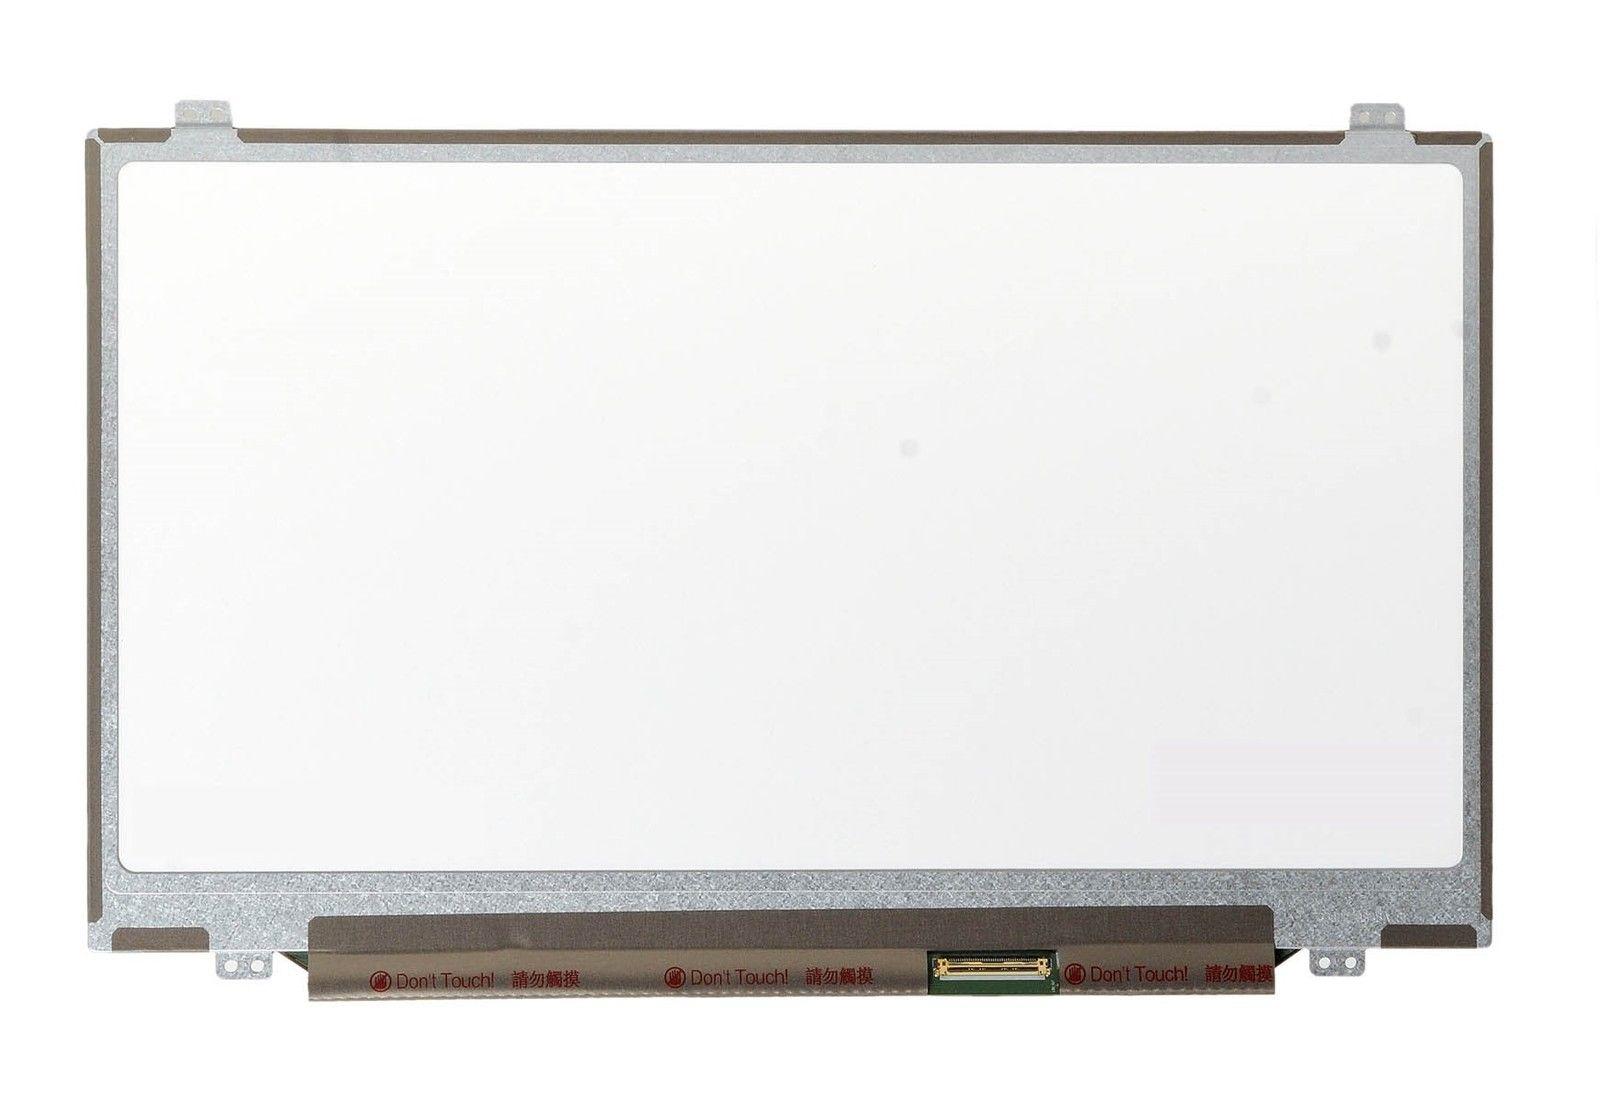 For Asus X401 X401A X401U X401A-RBL4 New 14.0 HD Slim LED LCD Screen Display